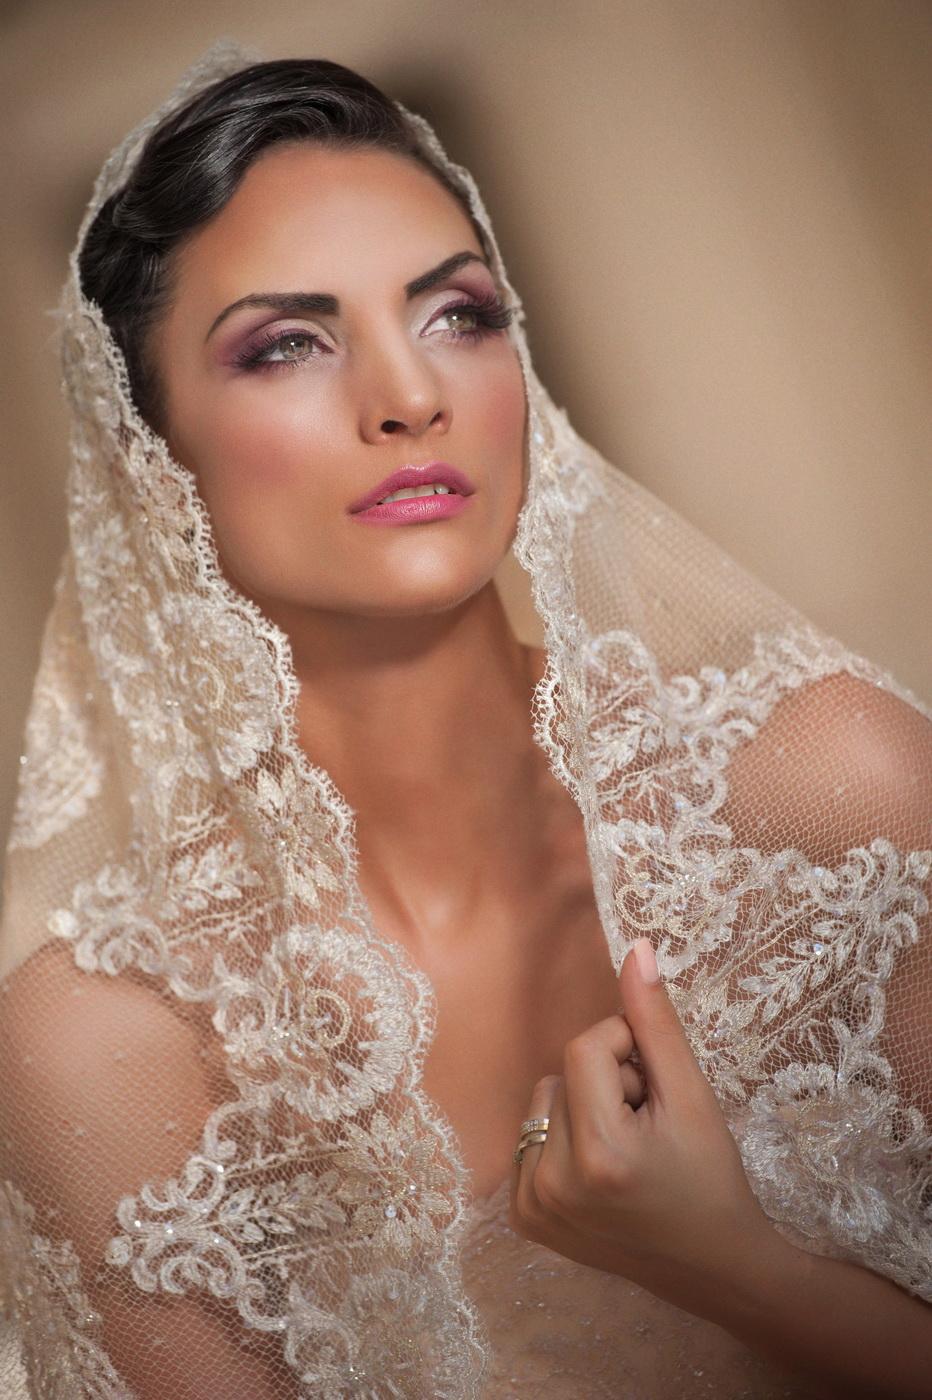 Destination Wedding Photographer_Marian Sterea_010.jpg